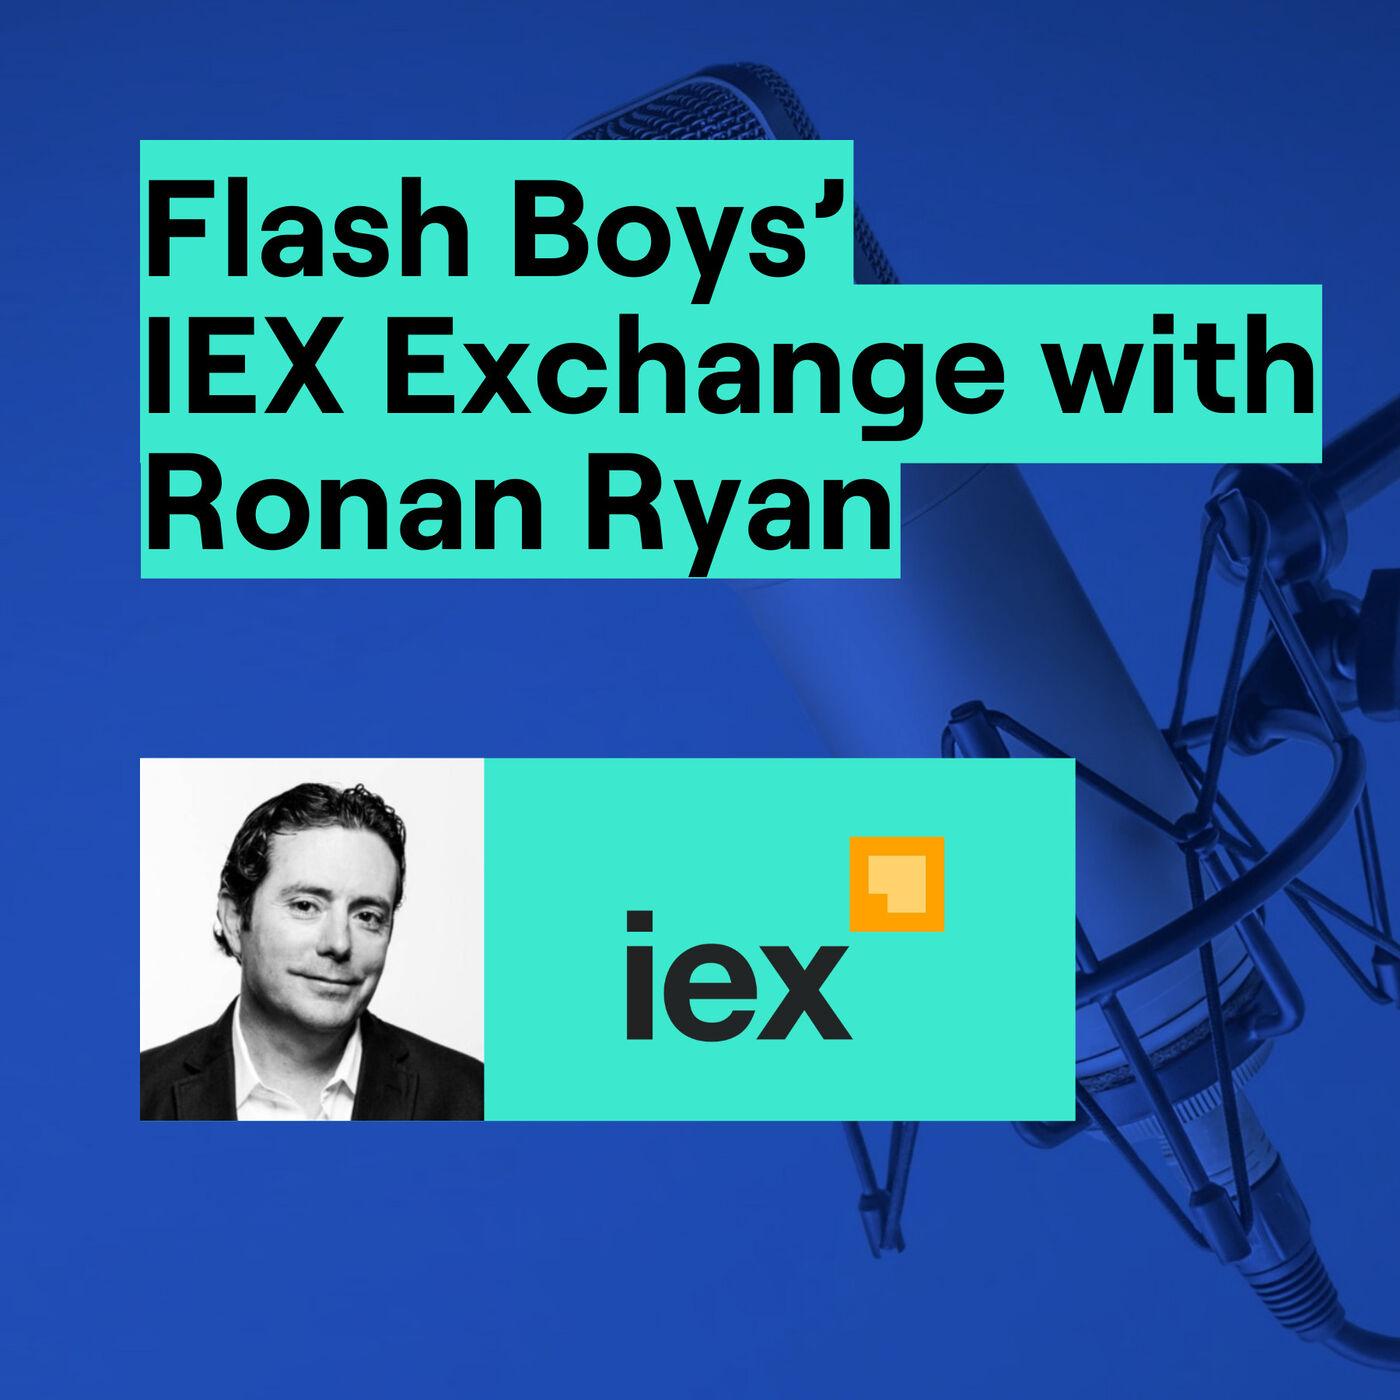 20. Flash Boys' IEX Exchange with Ronan Ryan